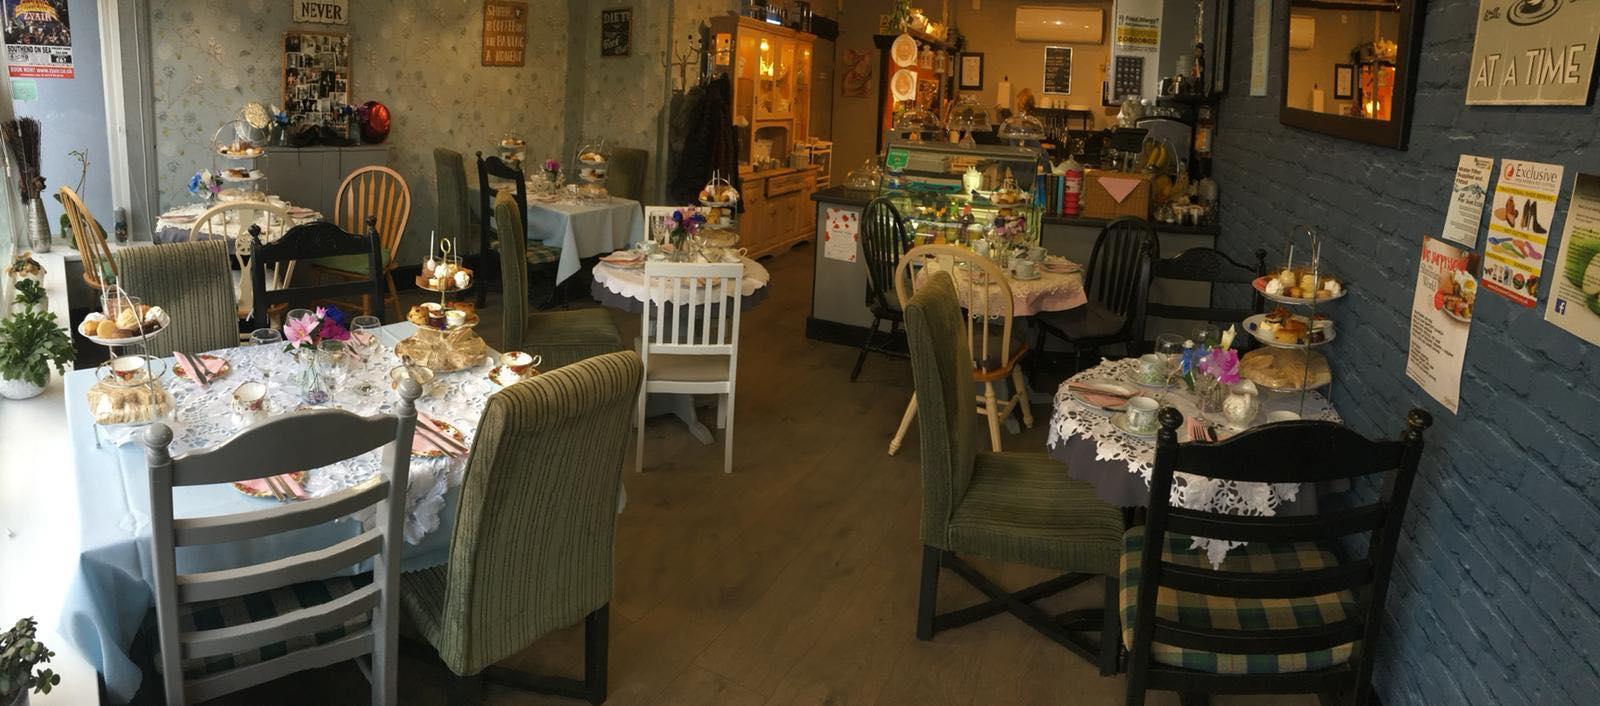 Aunt Sally's Tea Room & Coffee Shop